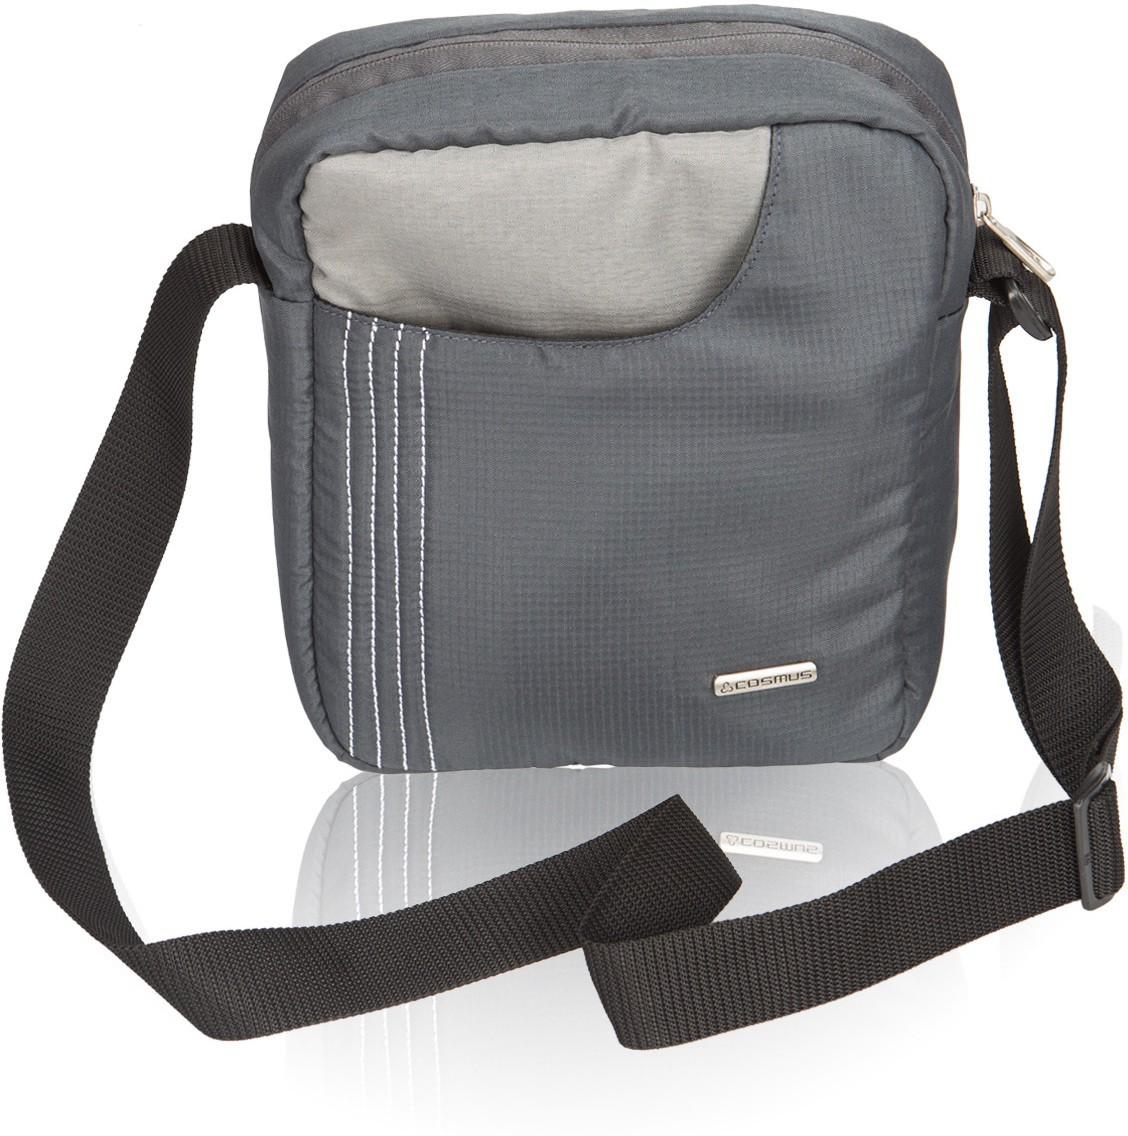 Sling bag below 500 - Cosmus Men Boys Grey Polyester Sling Bag